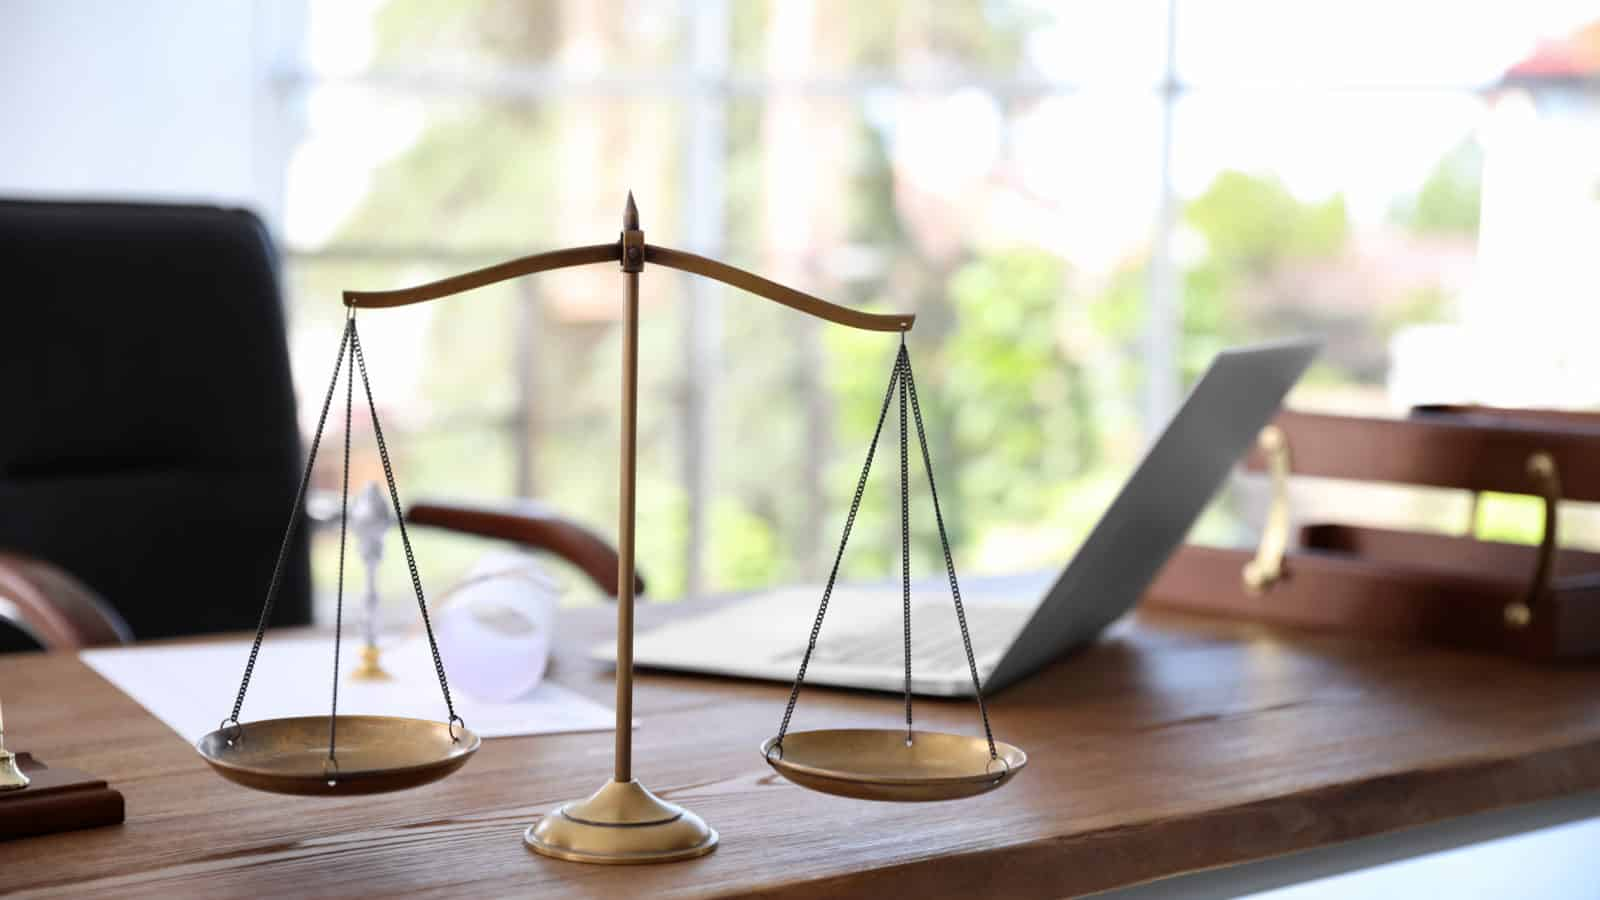 Digital marketing for a law firm